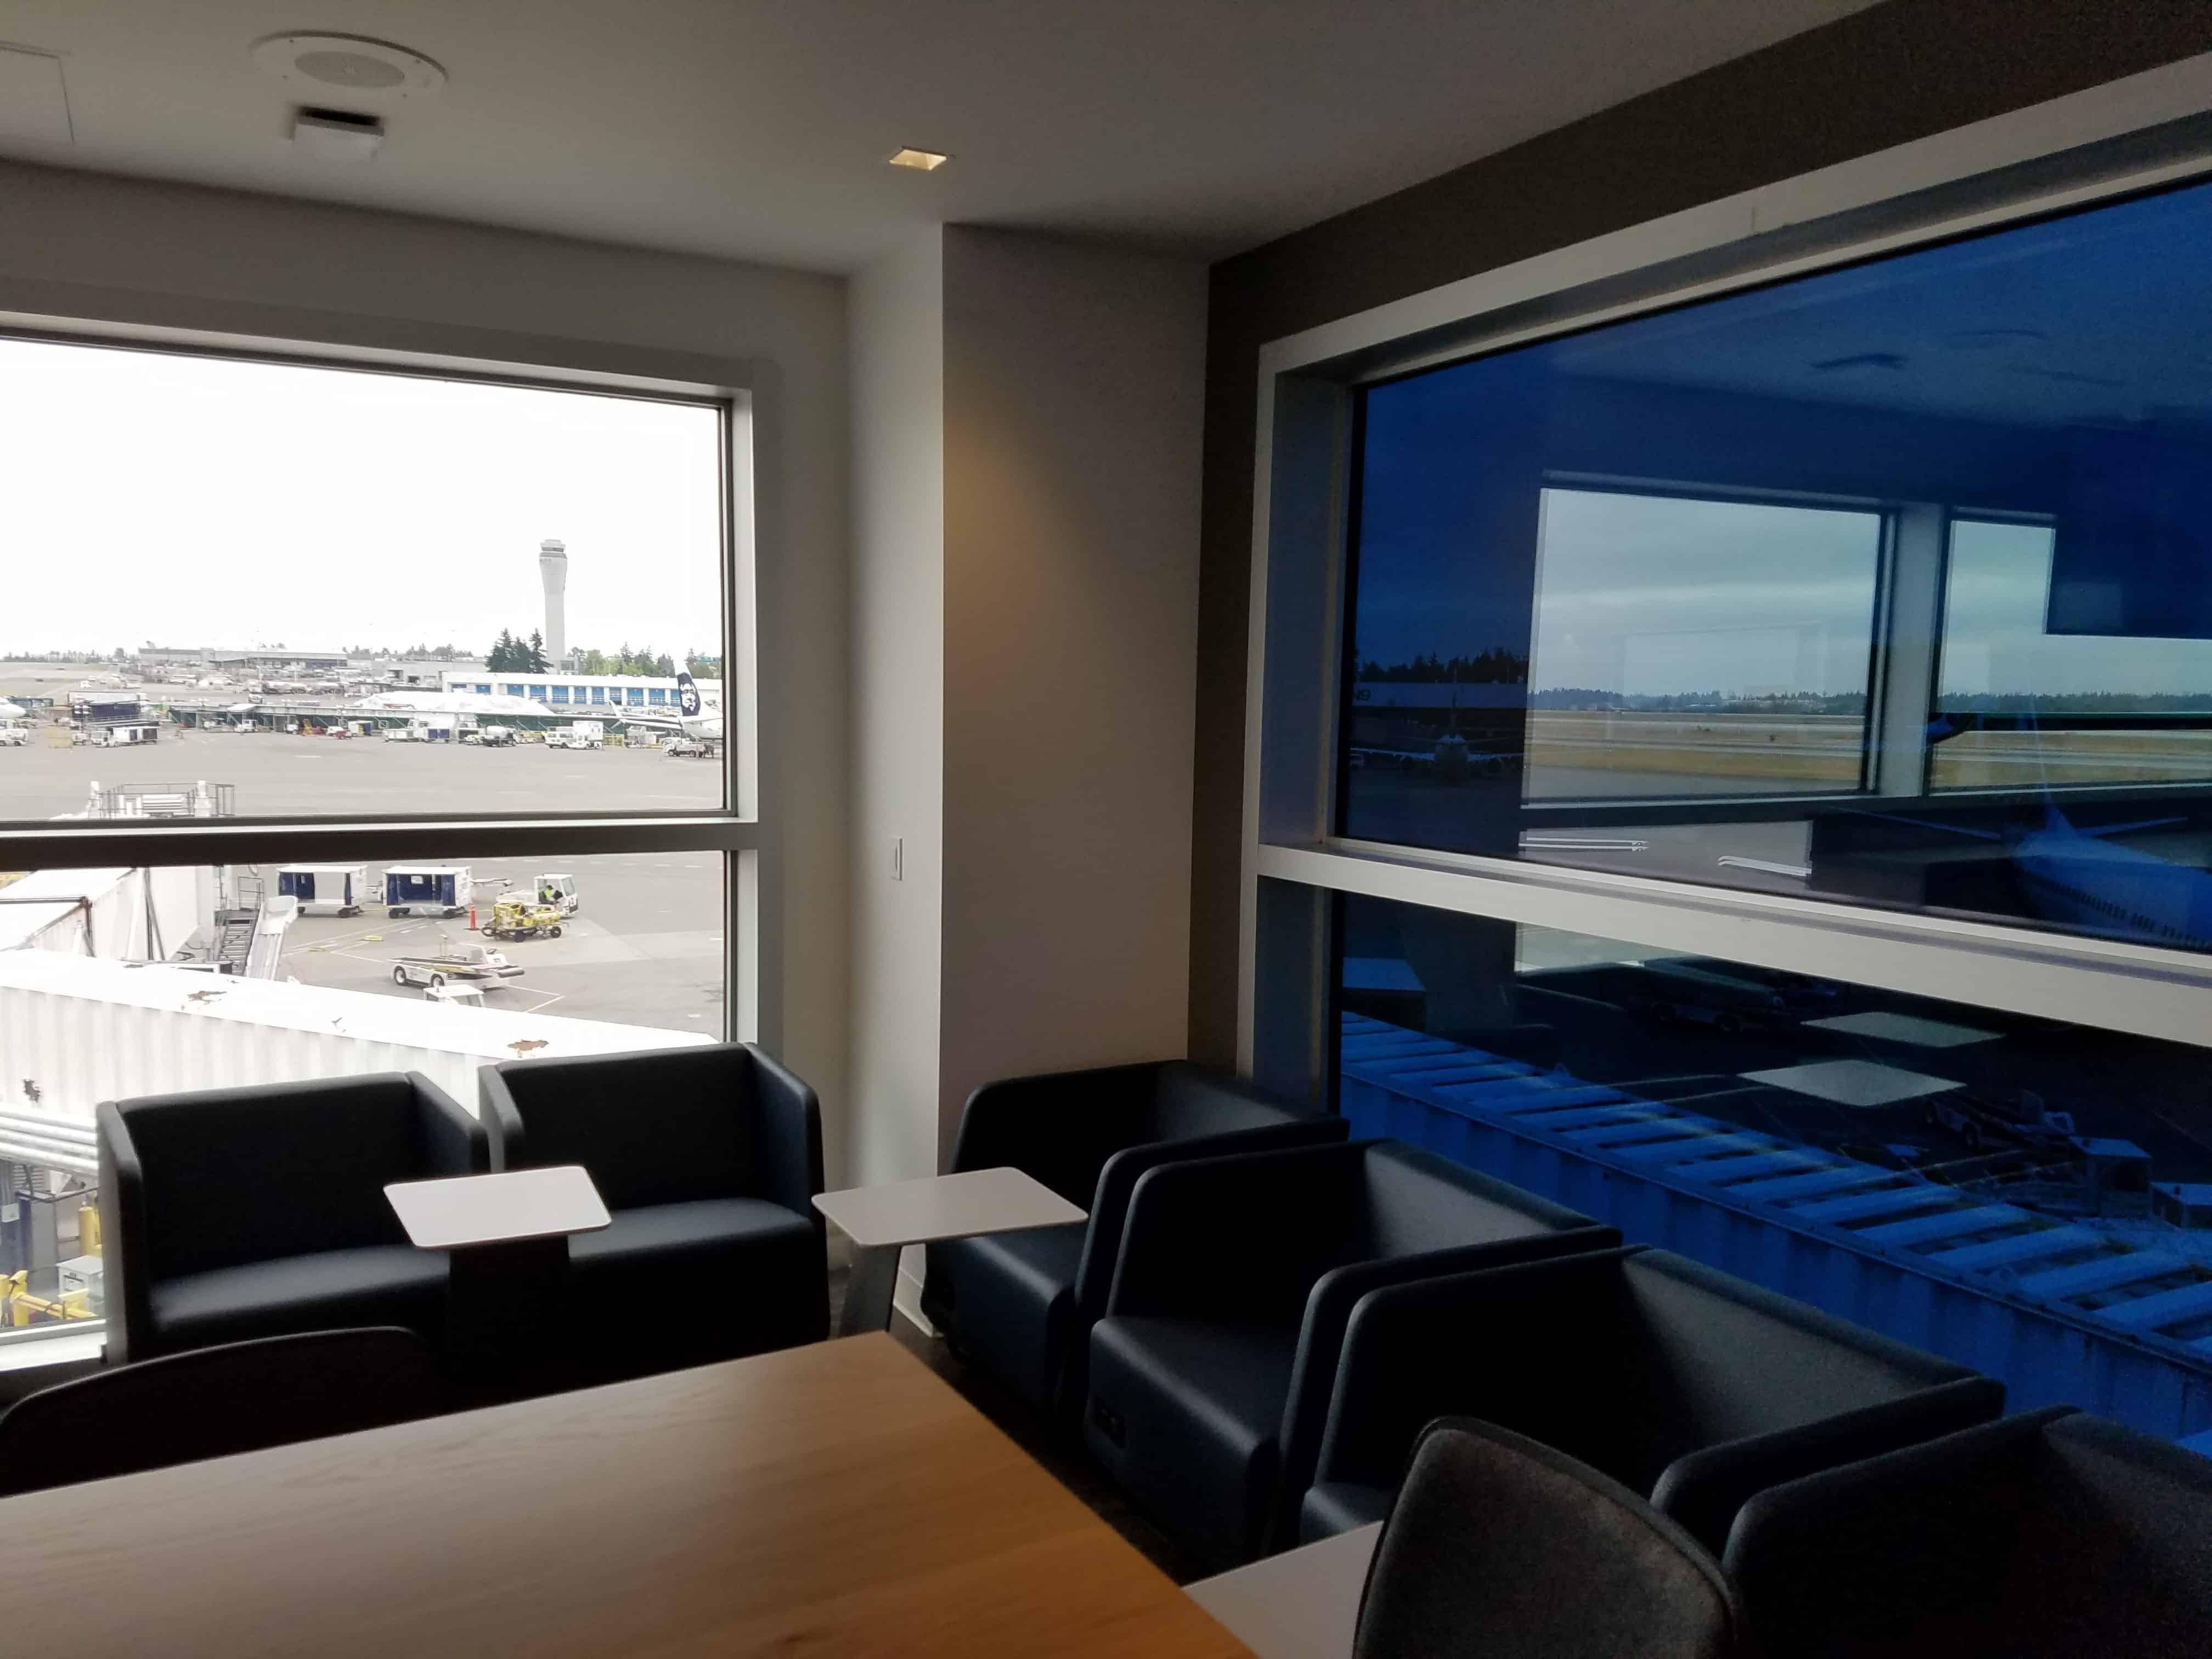 Alaska Lounge in Concourse C at Sea-Tac | SingleFlyer